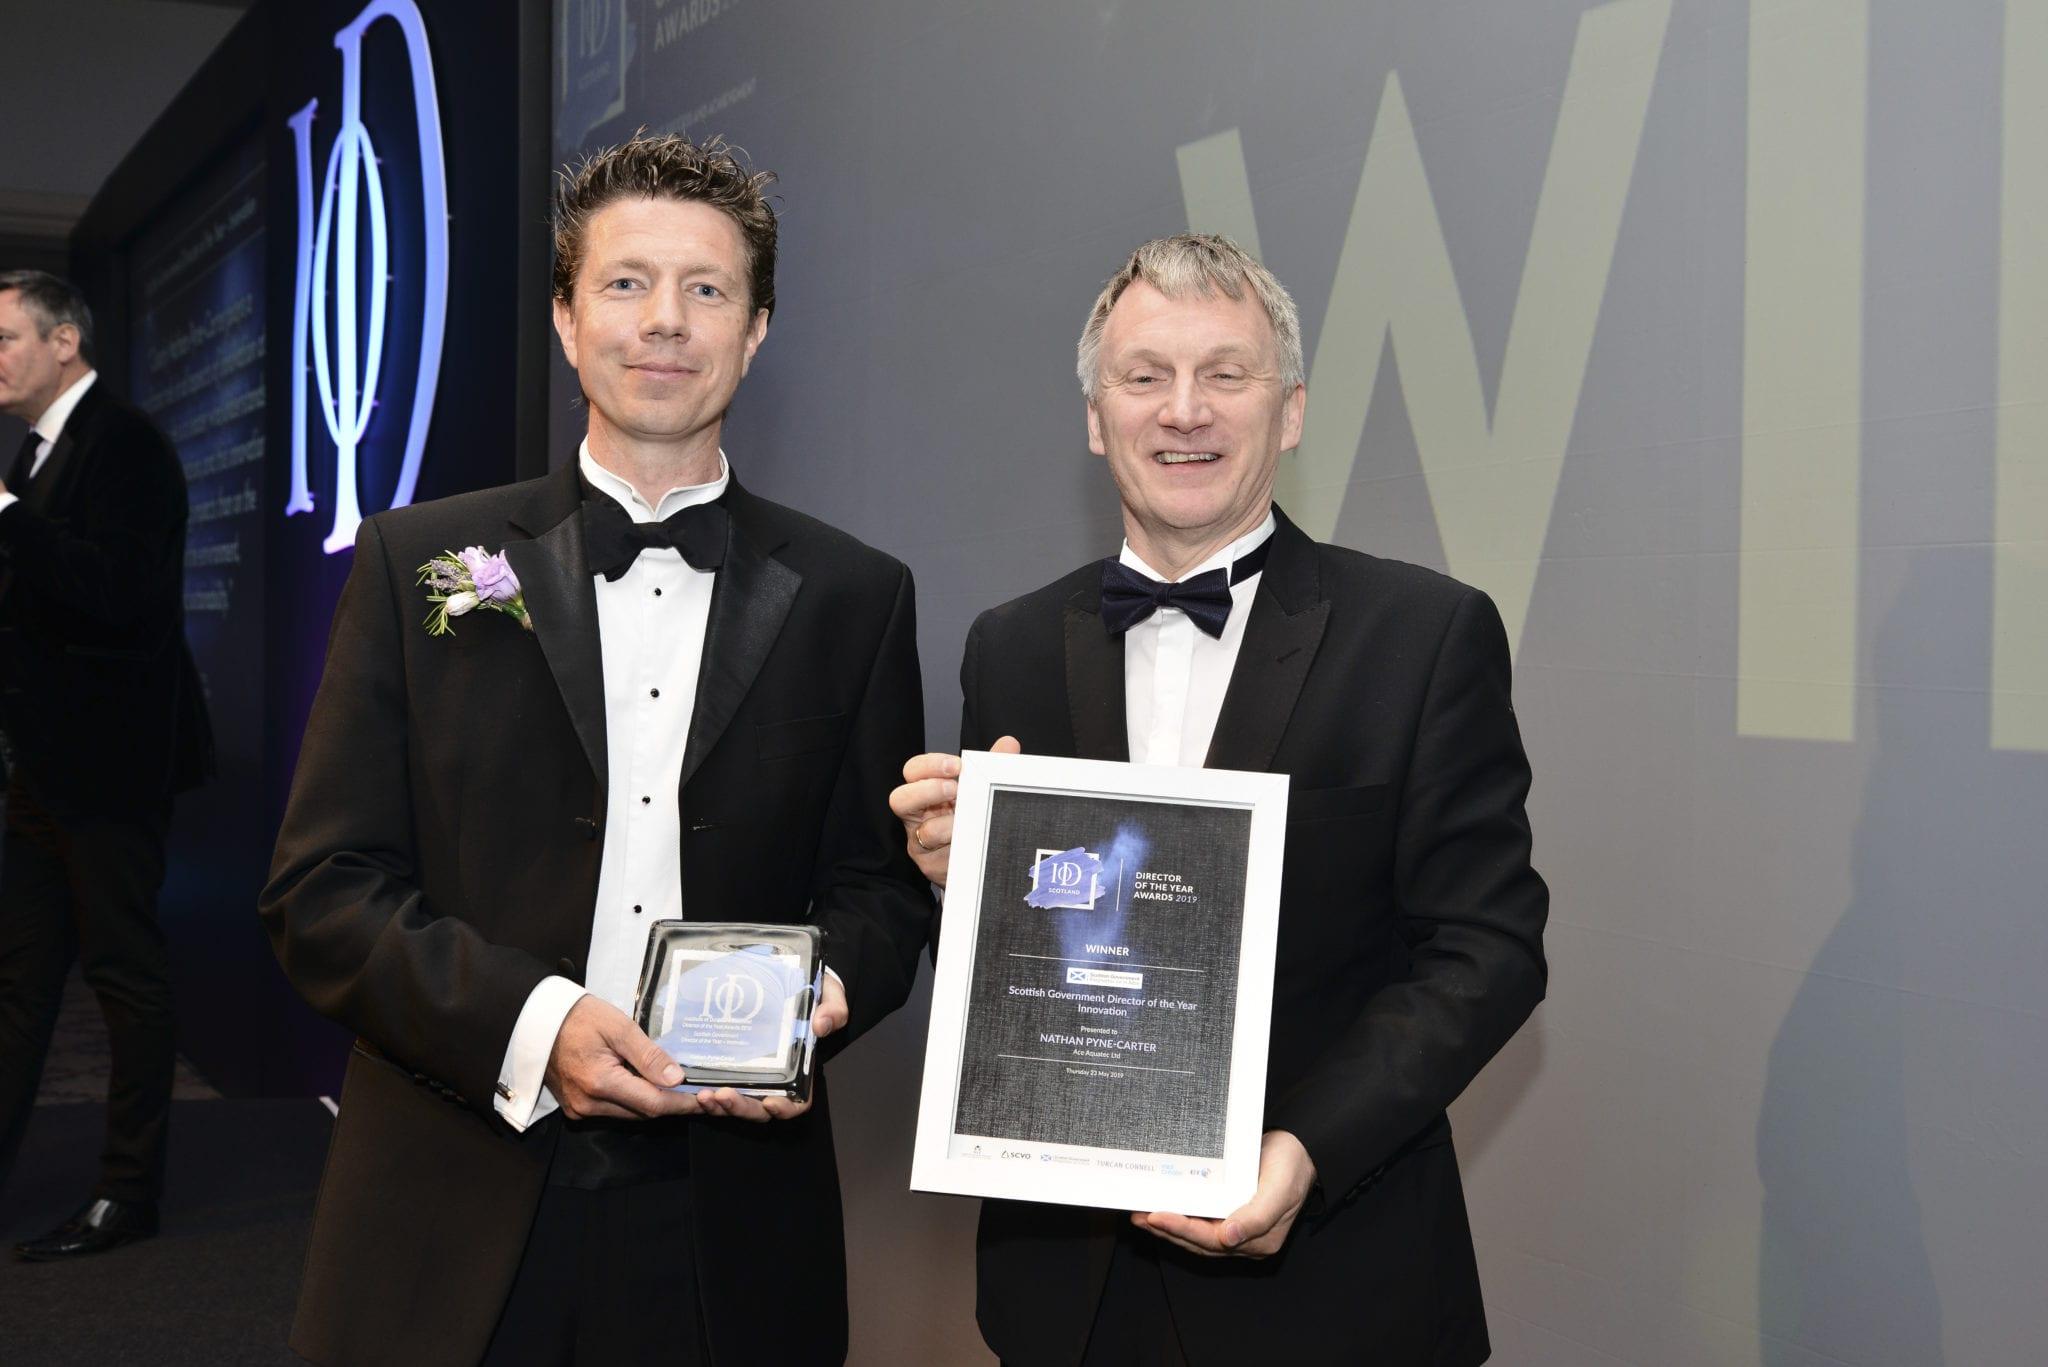 Managing Director Nathan Pyne-Carter wins Scotland Director of the Year award